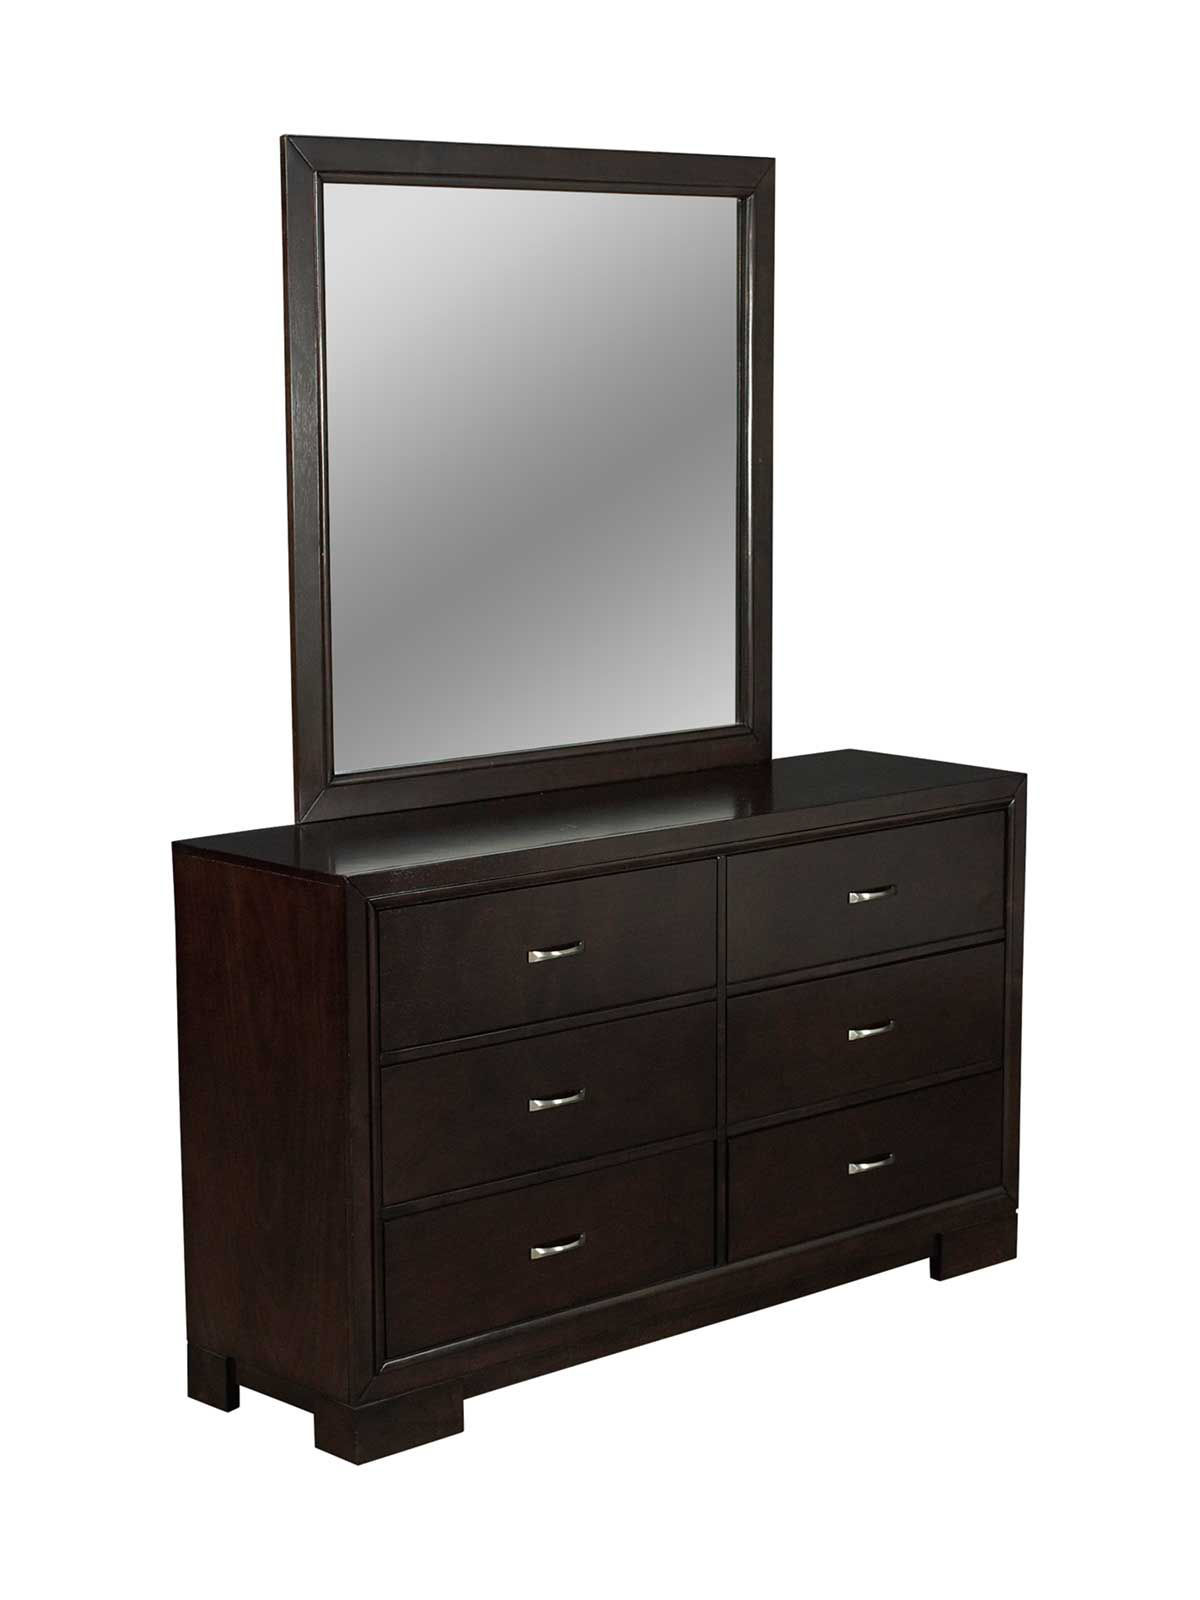 Liam Dresser Mirror Badcock Home Furniture More